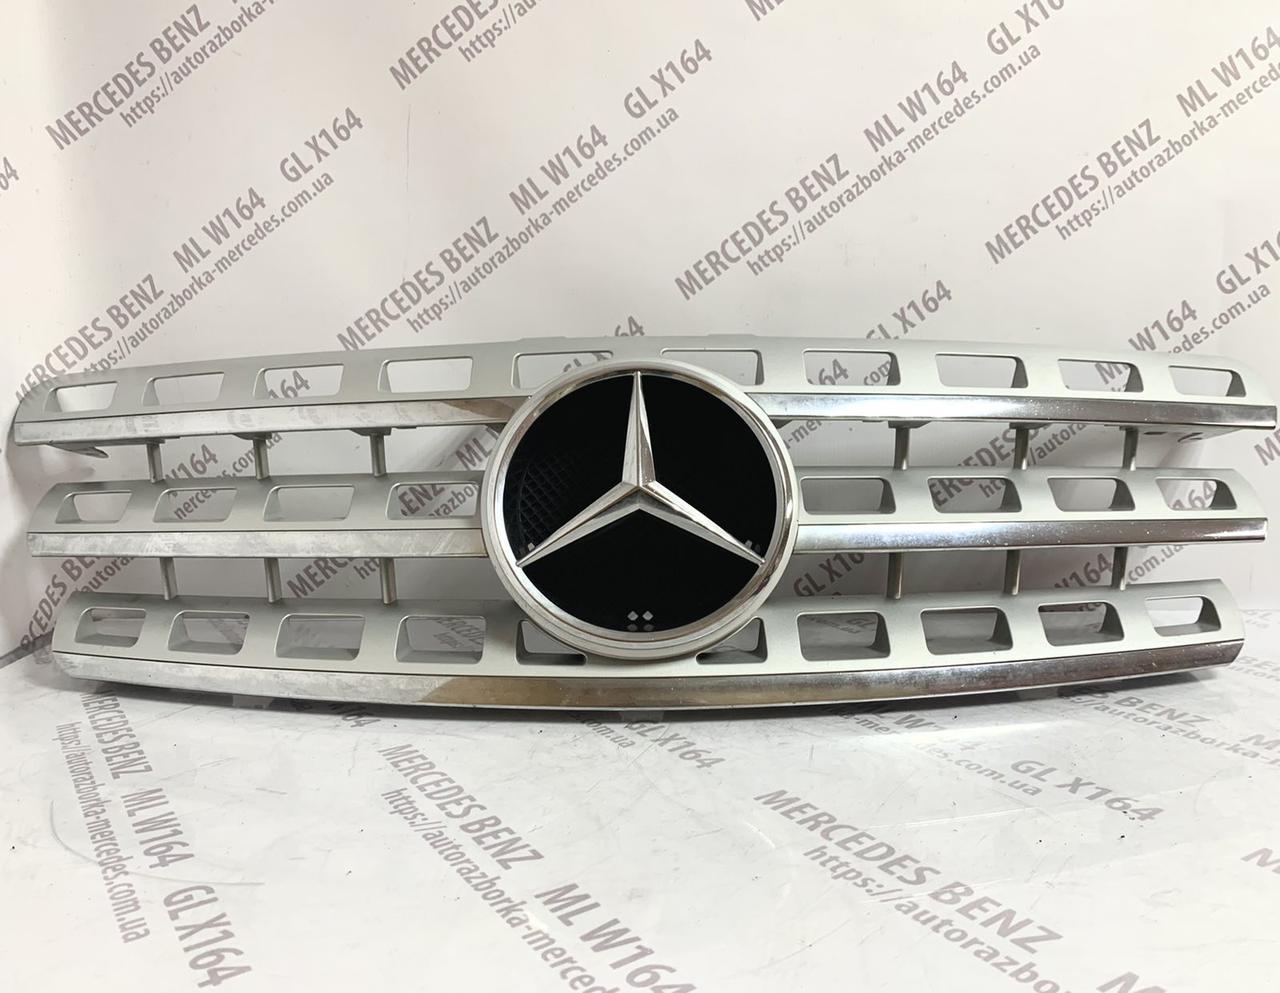 Решетка радиатора Mercedes ML W164 рестайл Мерседес МЛ 164 2008 2009 2010 2011